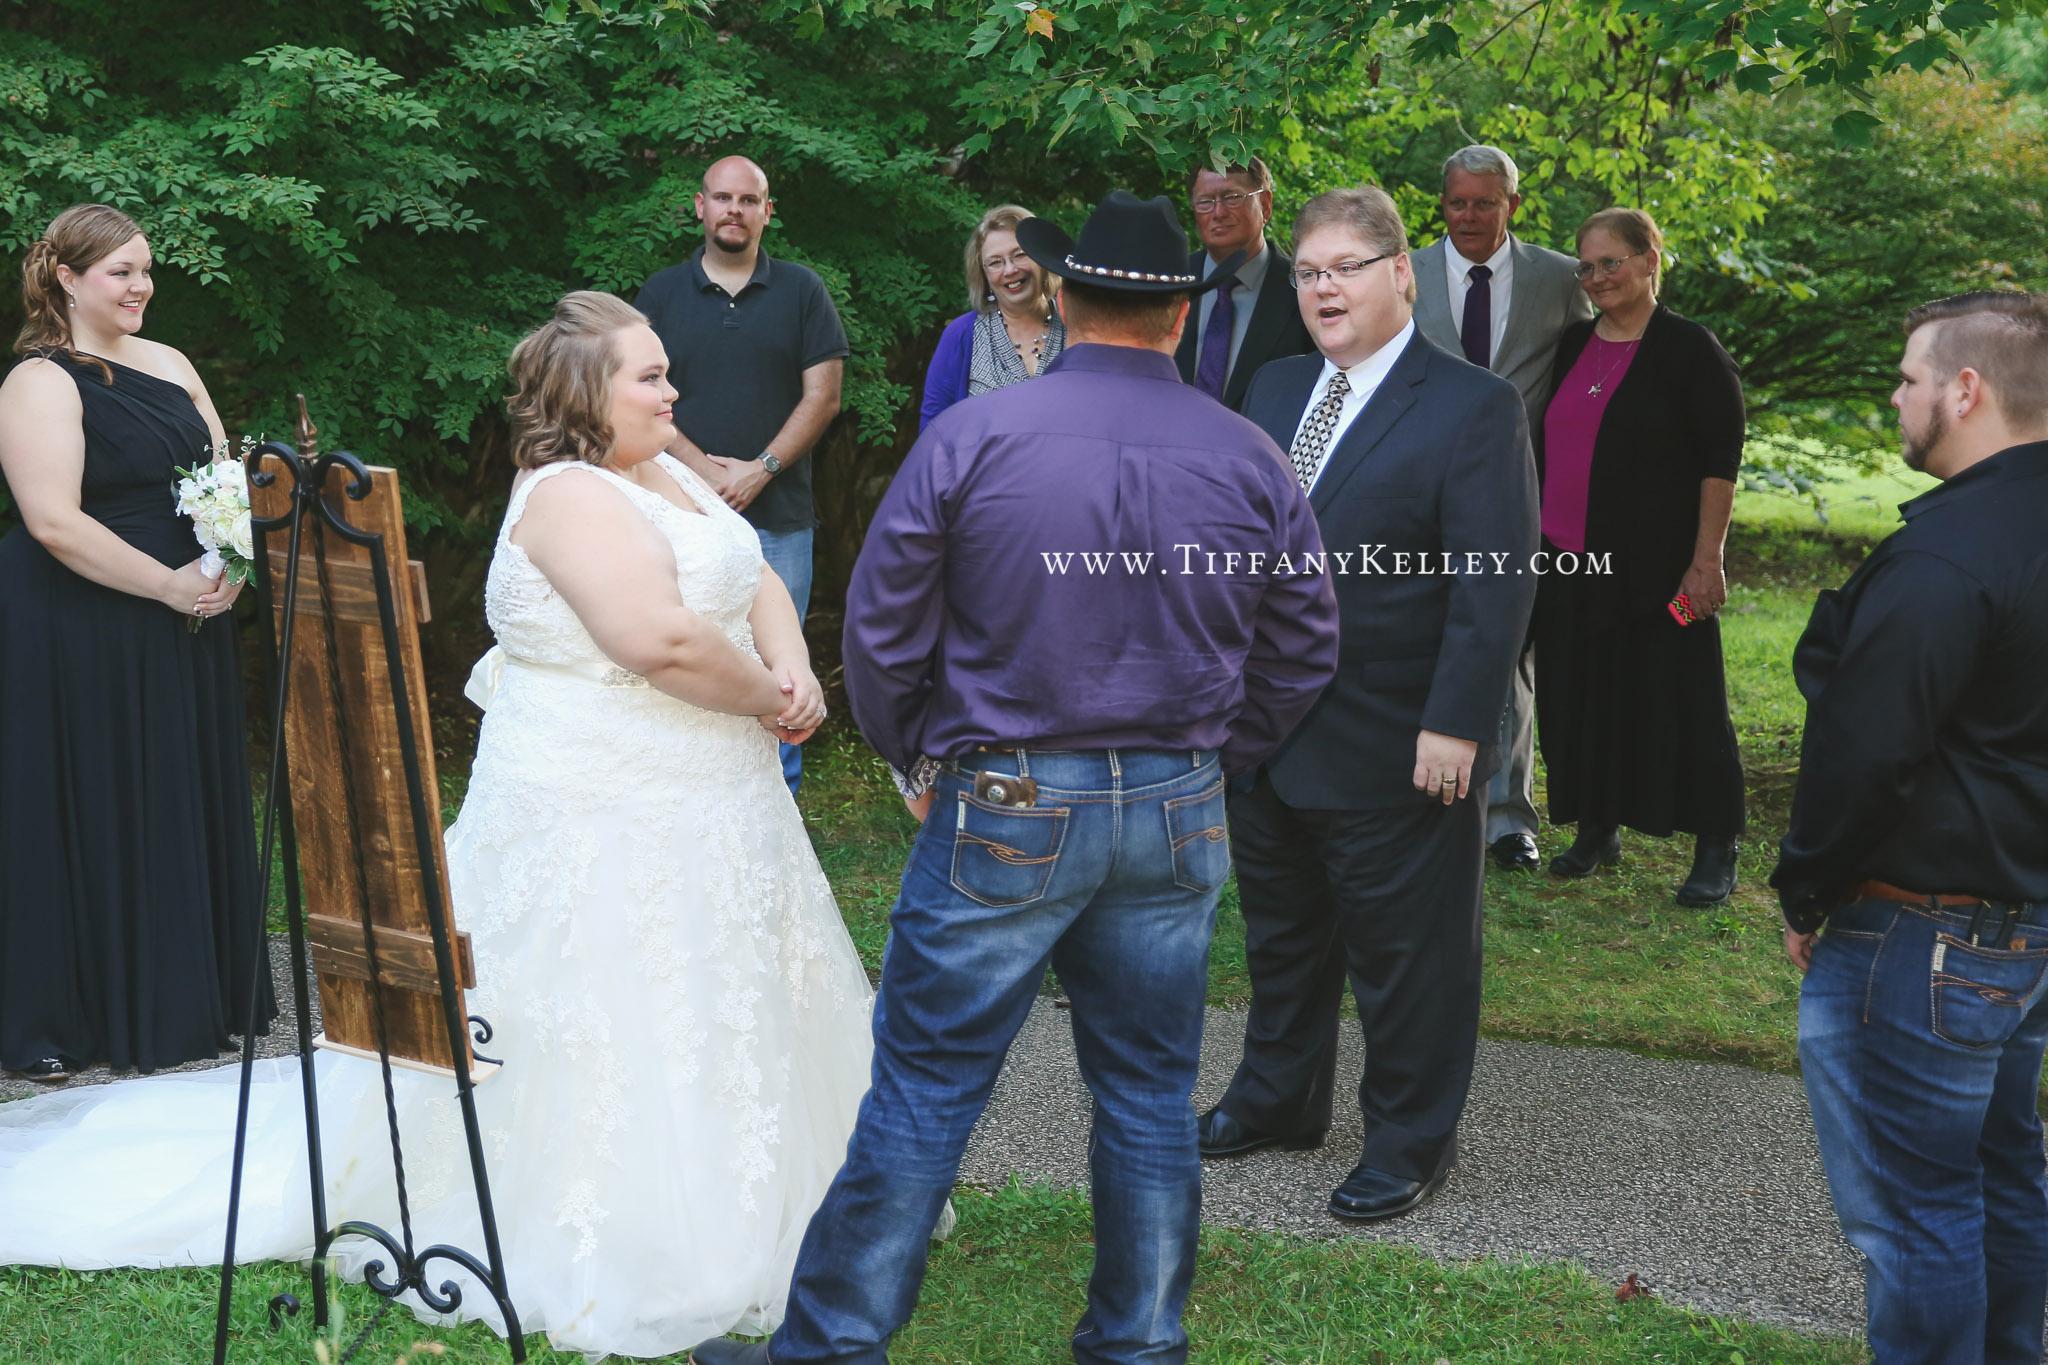 branson-missouri-big-cedar-lodge-wedding-photographer-tiffany-kelley-photography-08